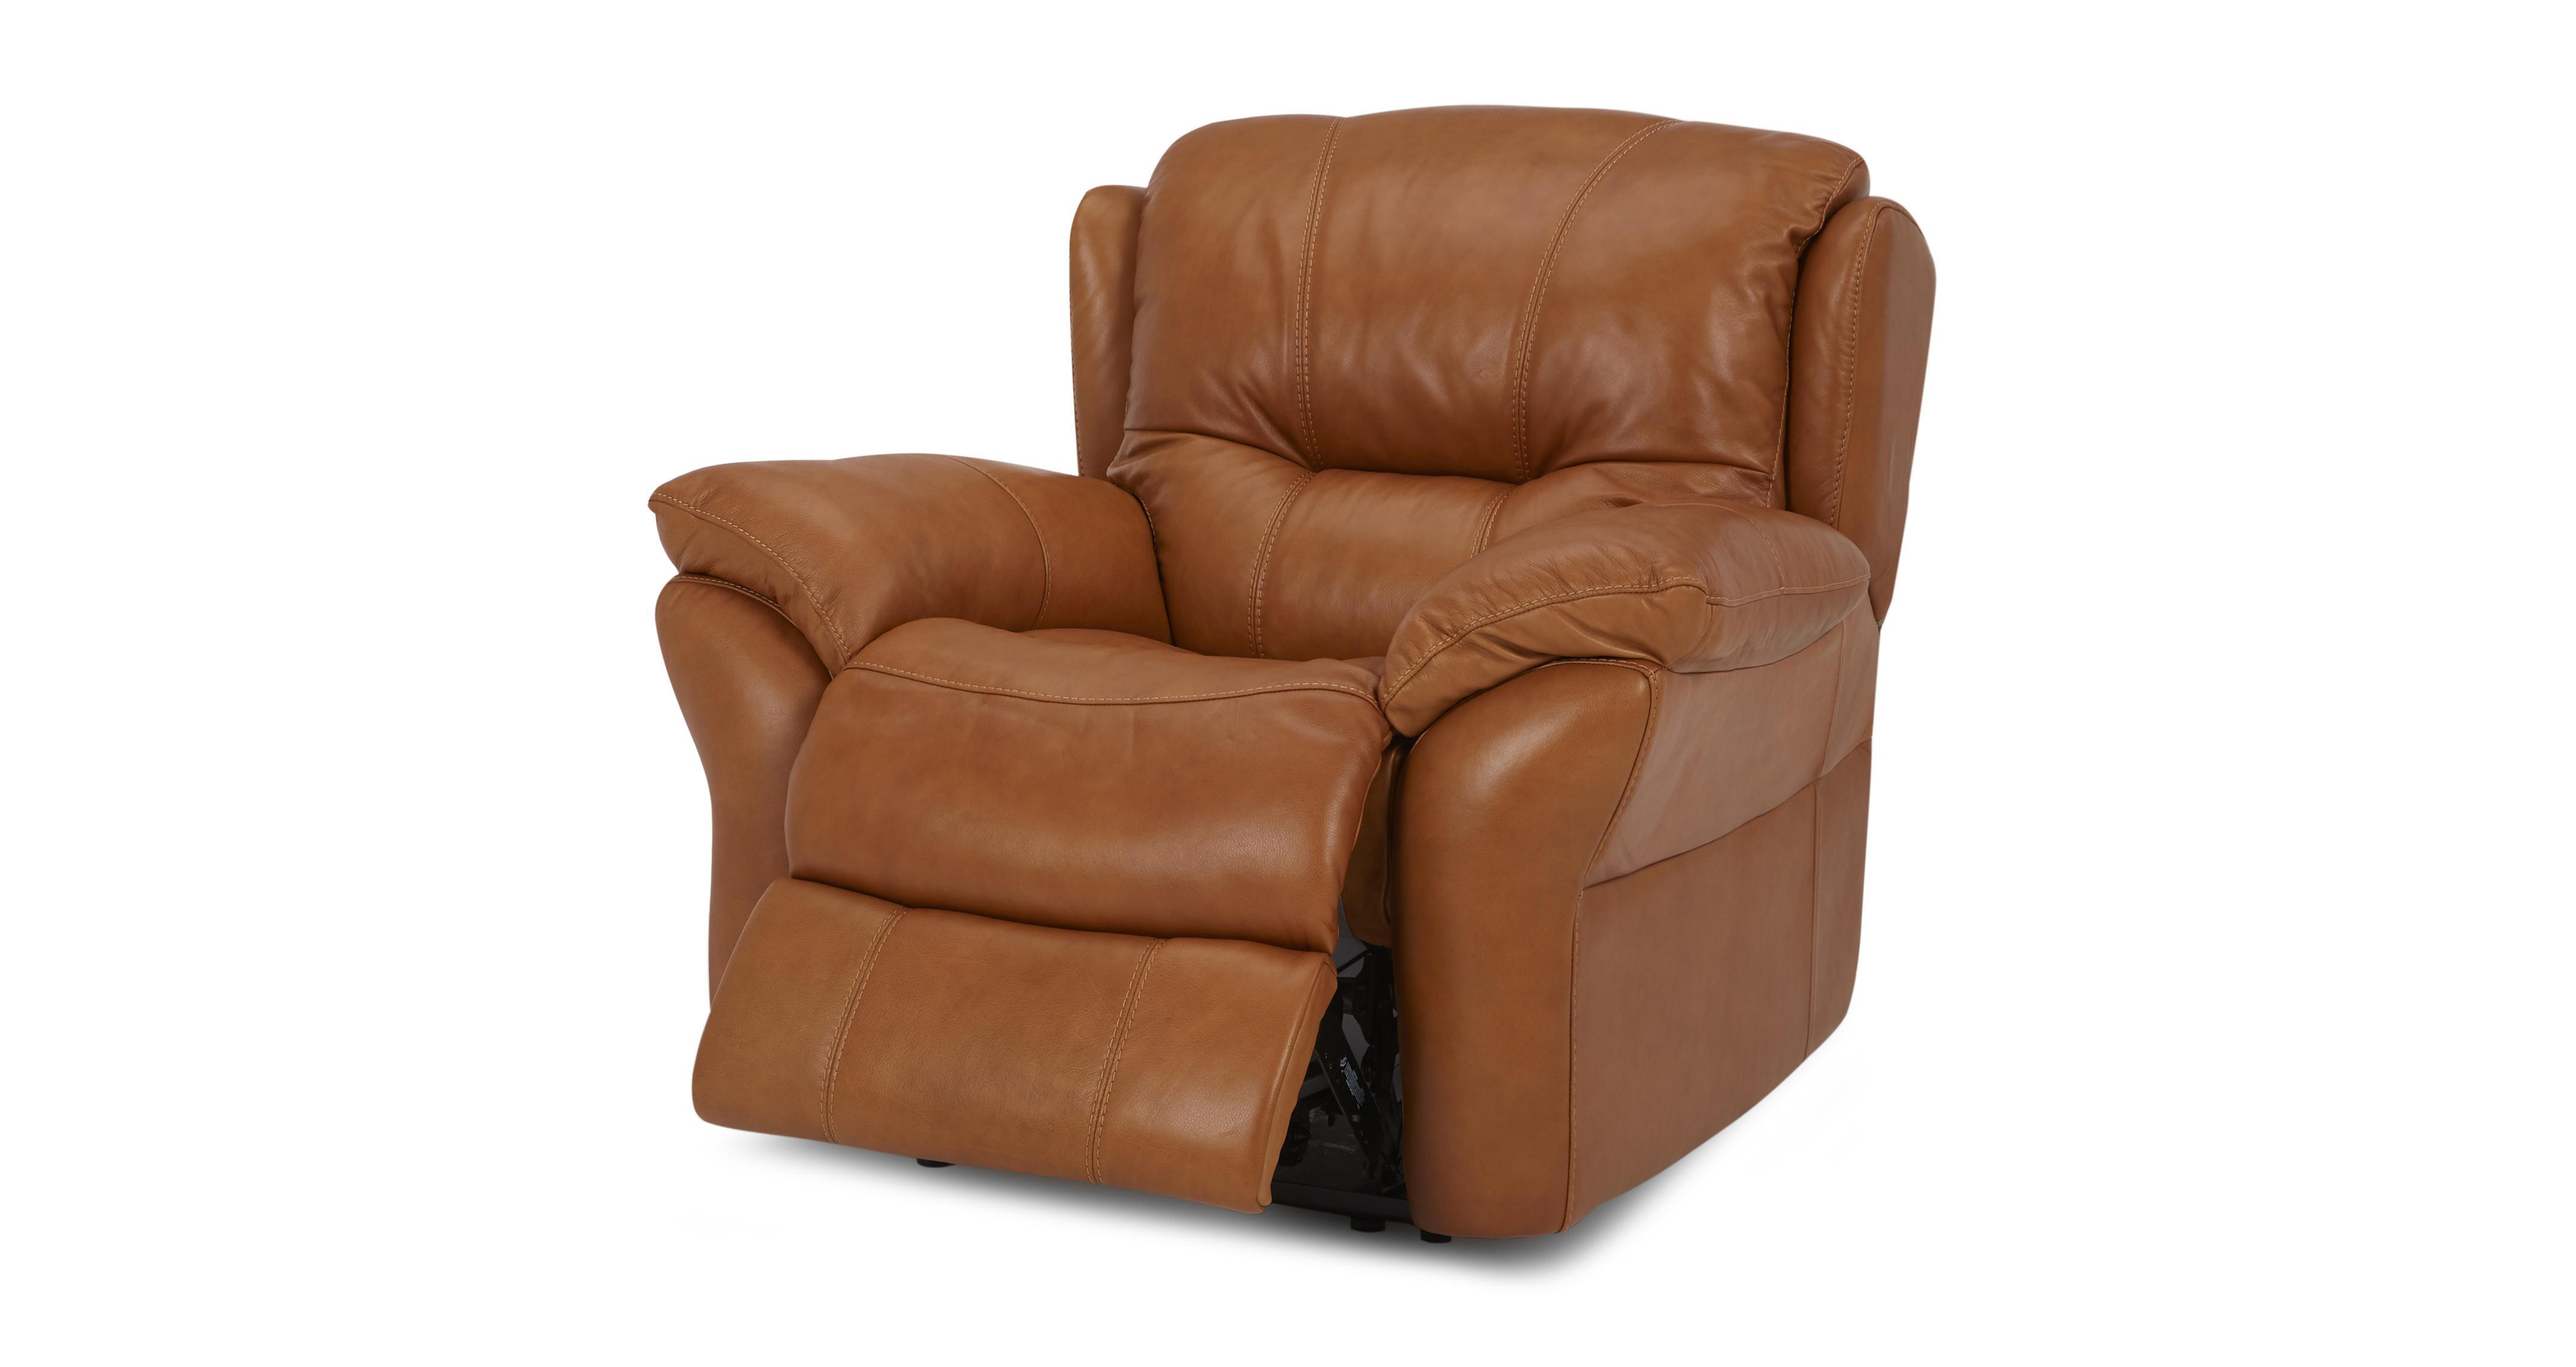 Carmello 3 seater power recliner palatial dfs